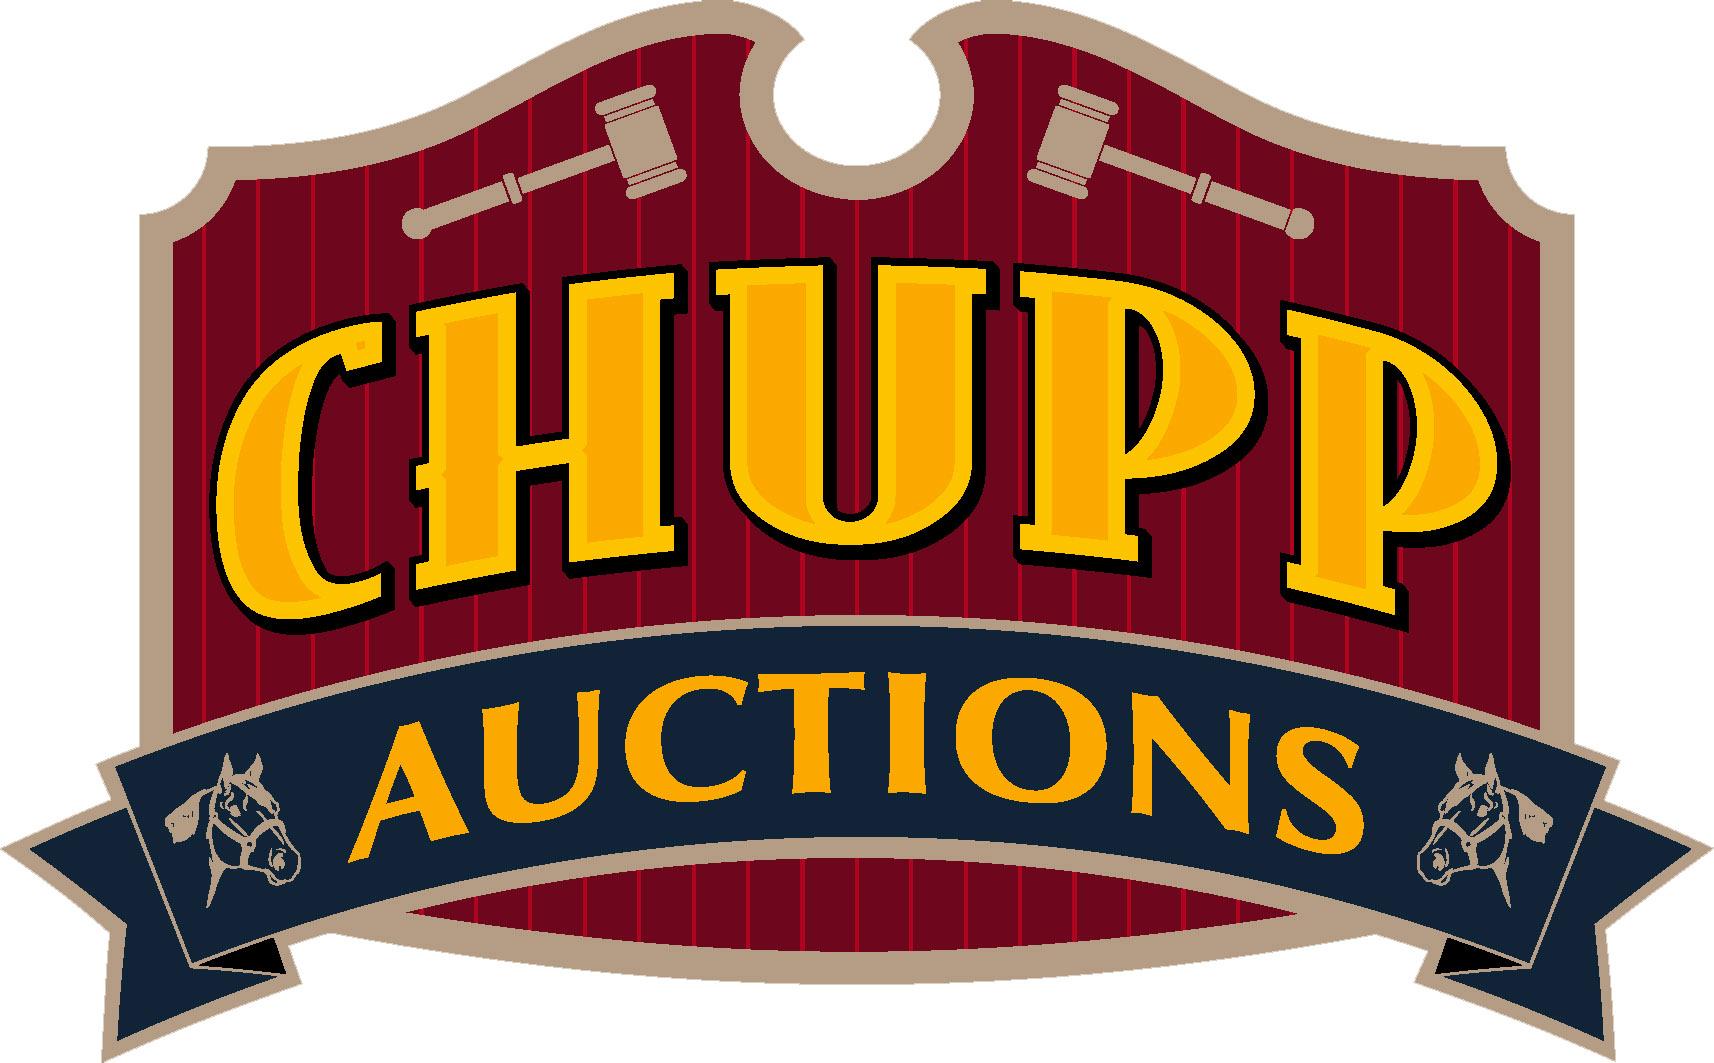 ChuppAuctions_LOGO-1.jpg